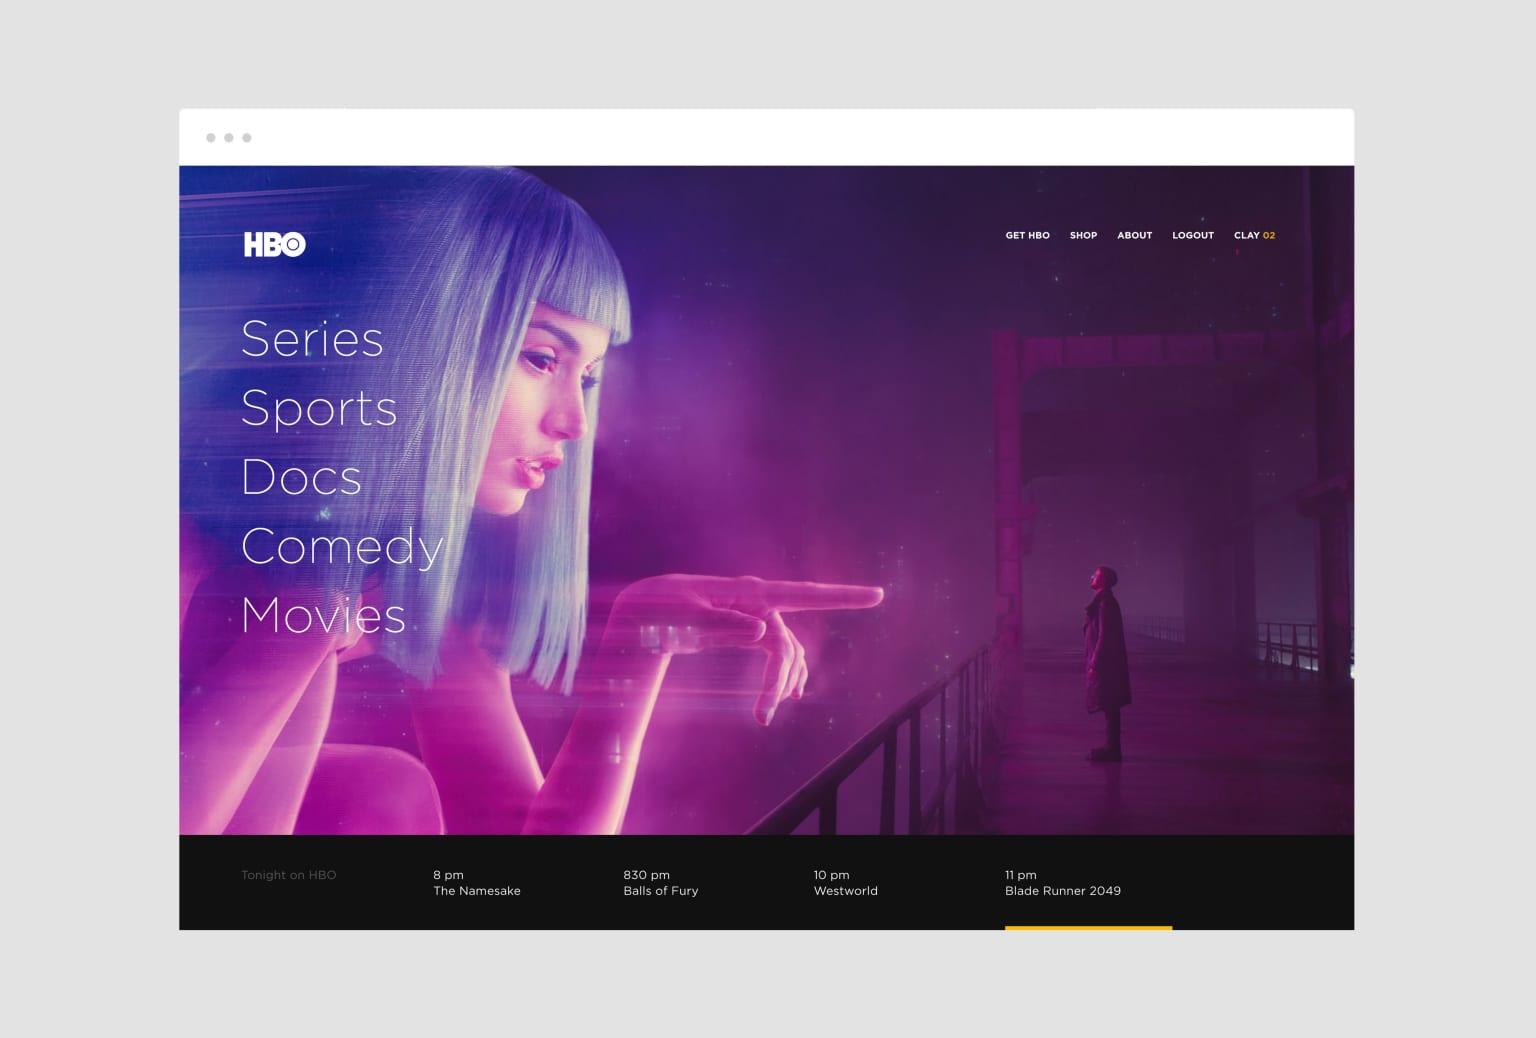 HBO Brand / Platform